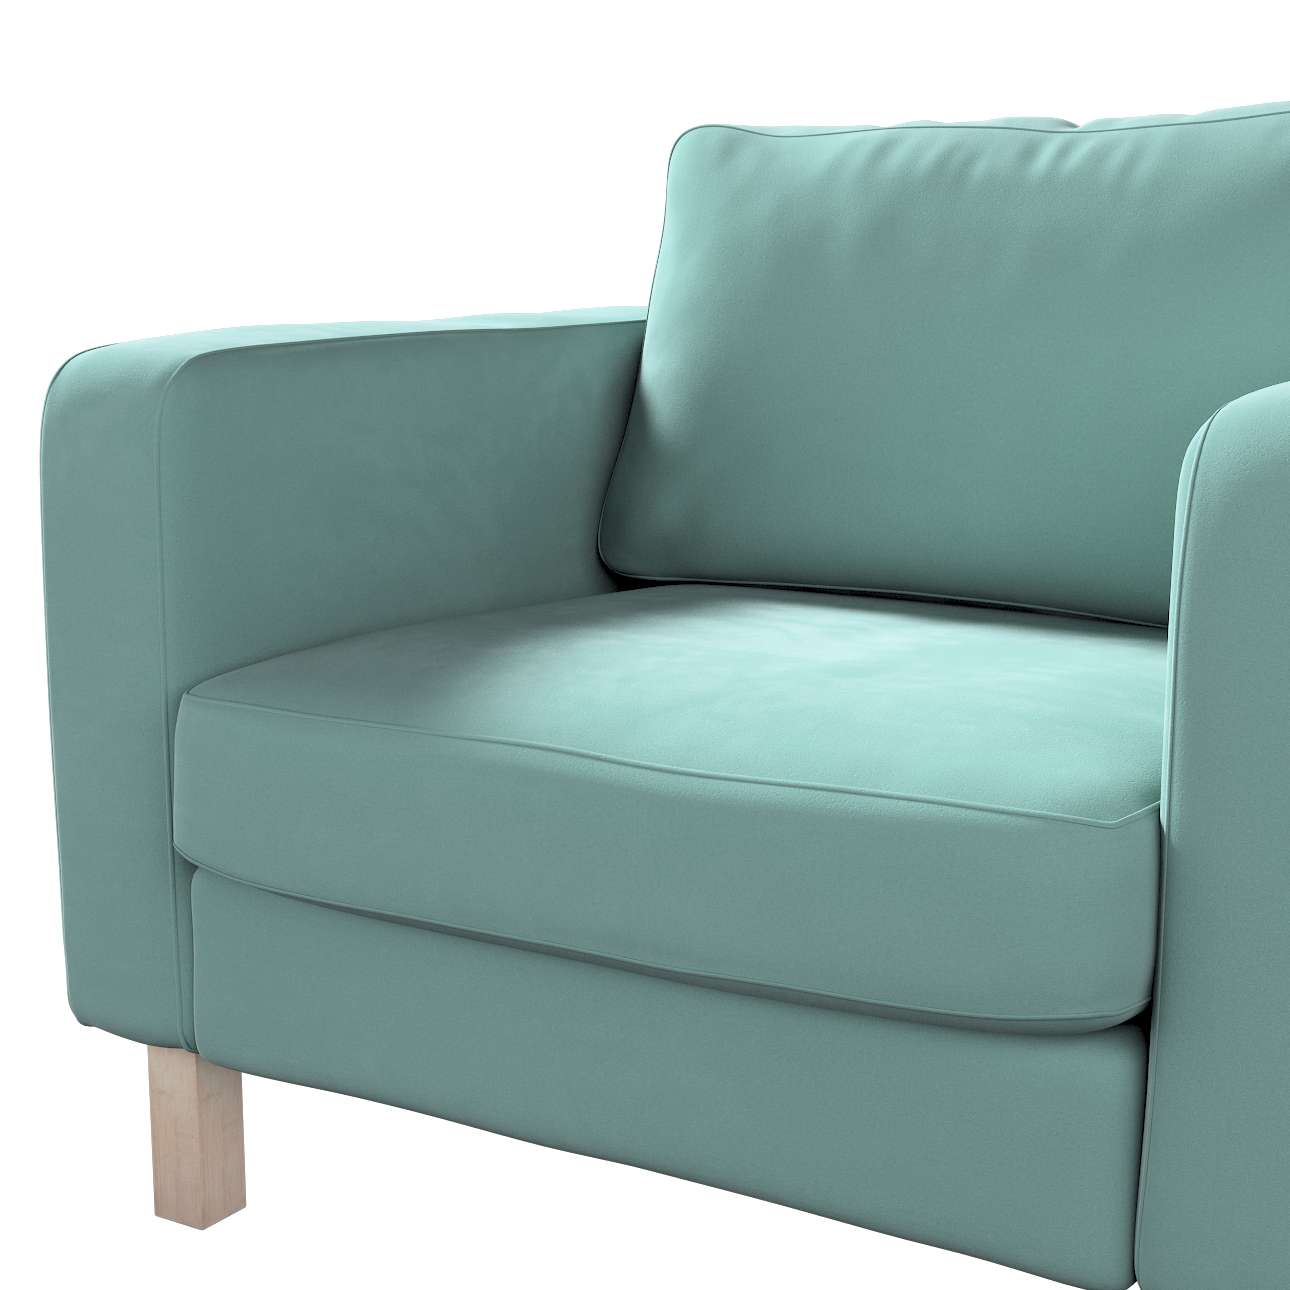 Pokrowiec na fotel Karlstad, krótki w kolekcji Velvet, tkanina: 704-18